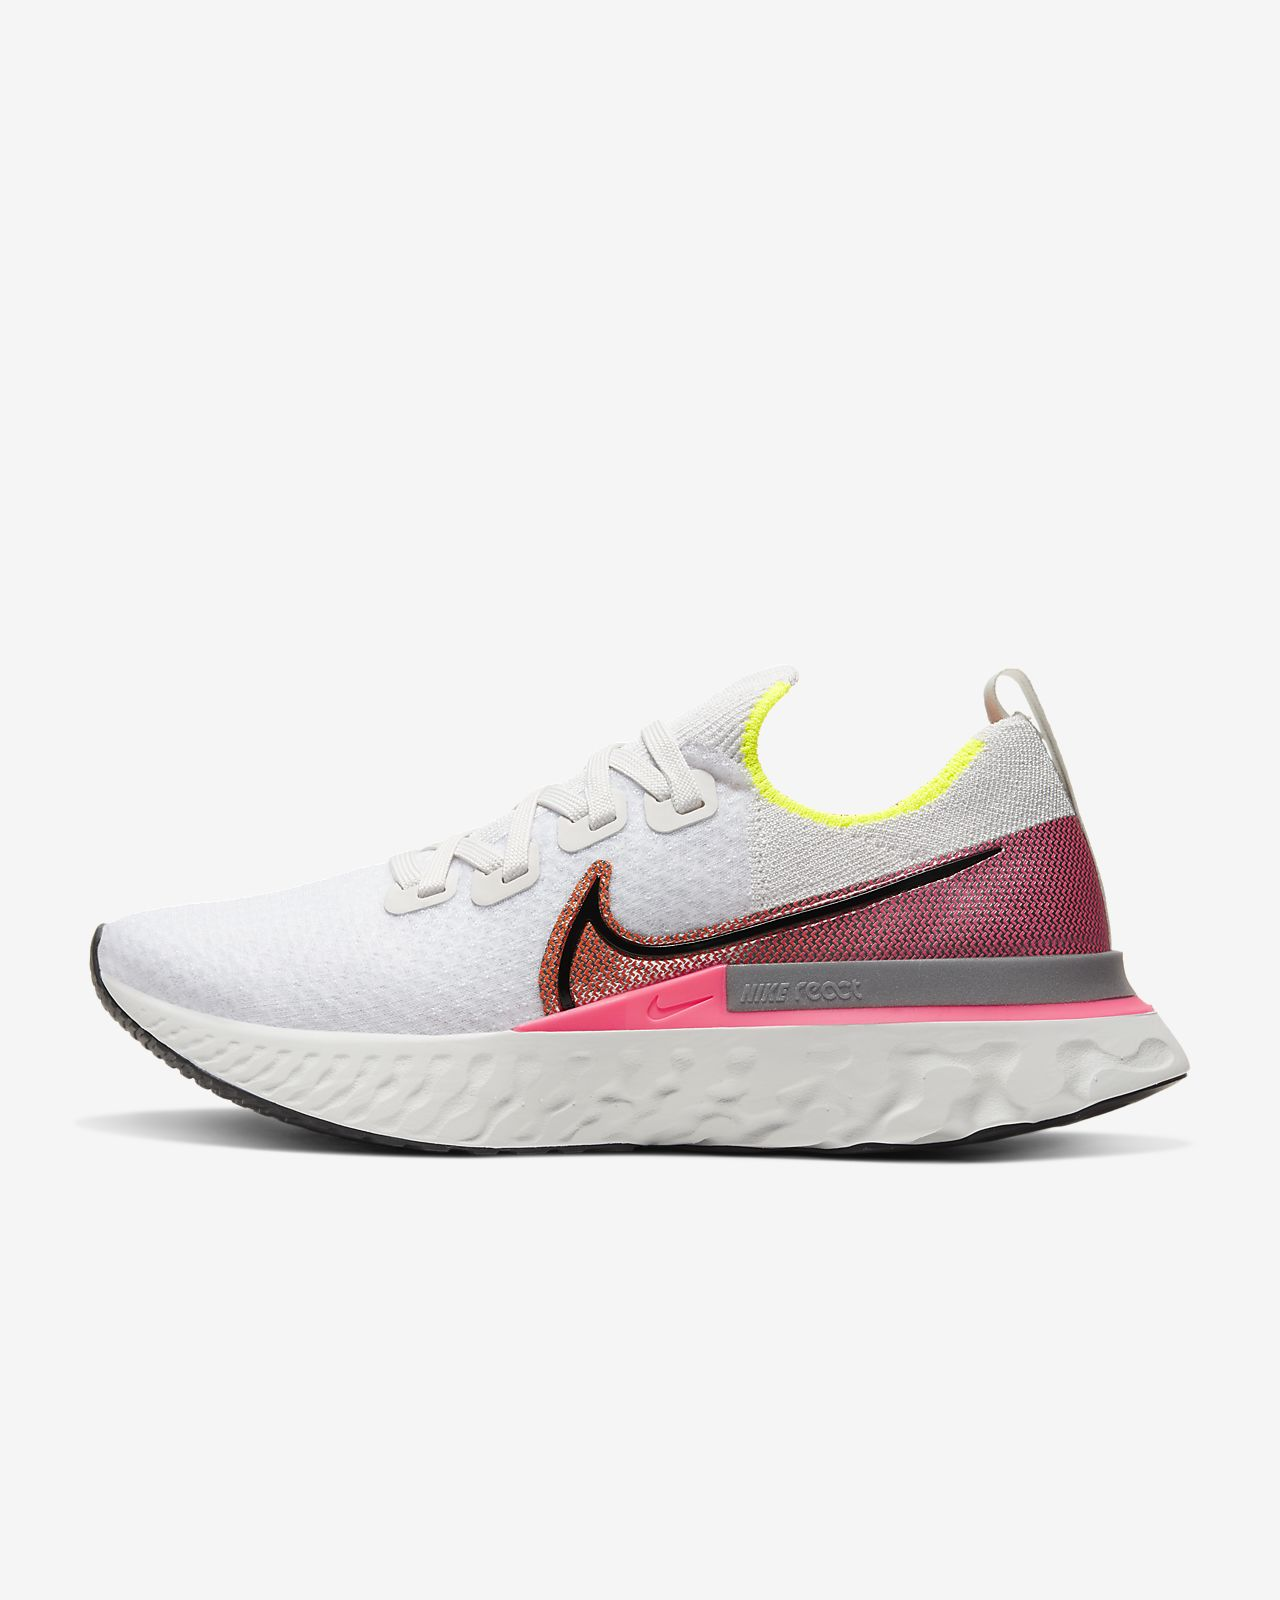 Sapatilhas de running Nike React Infinity Run Flyknit para mulher